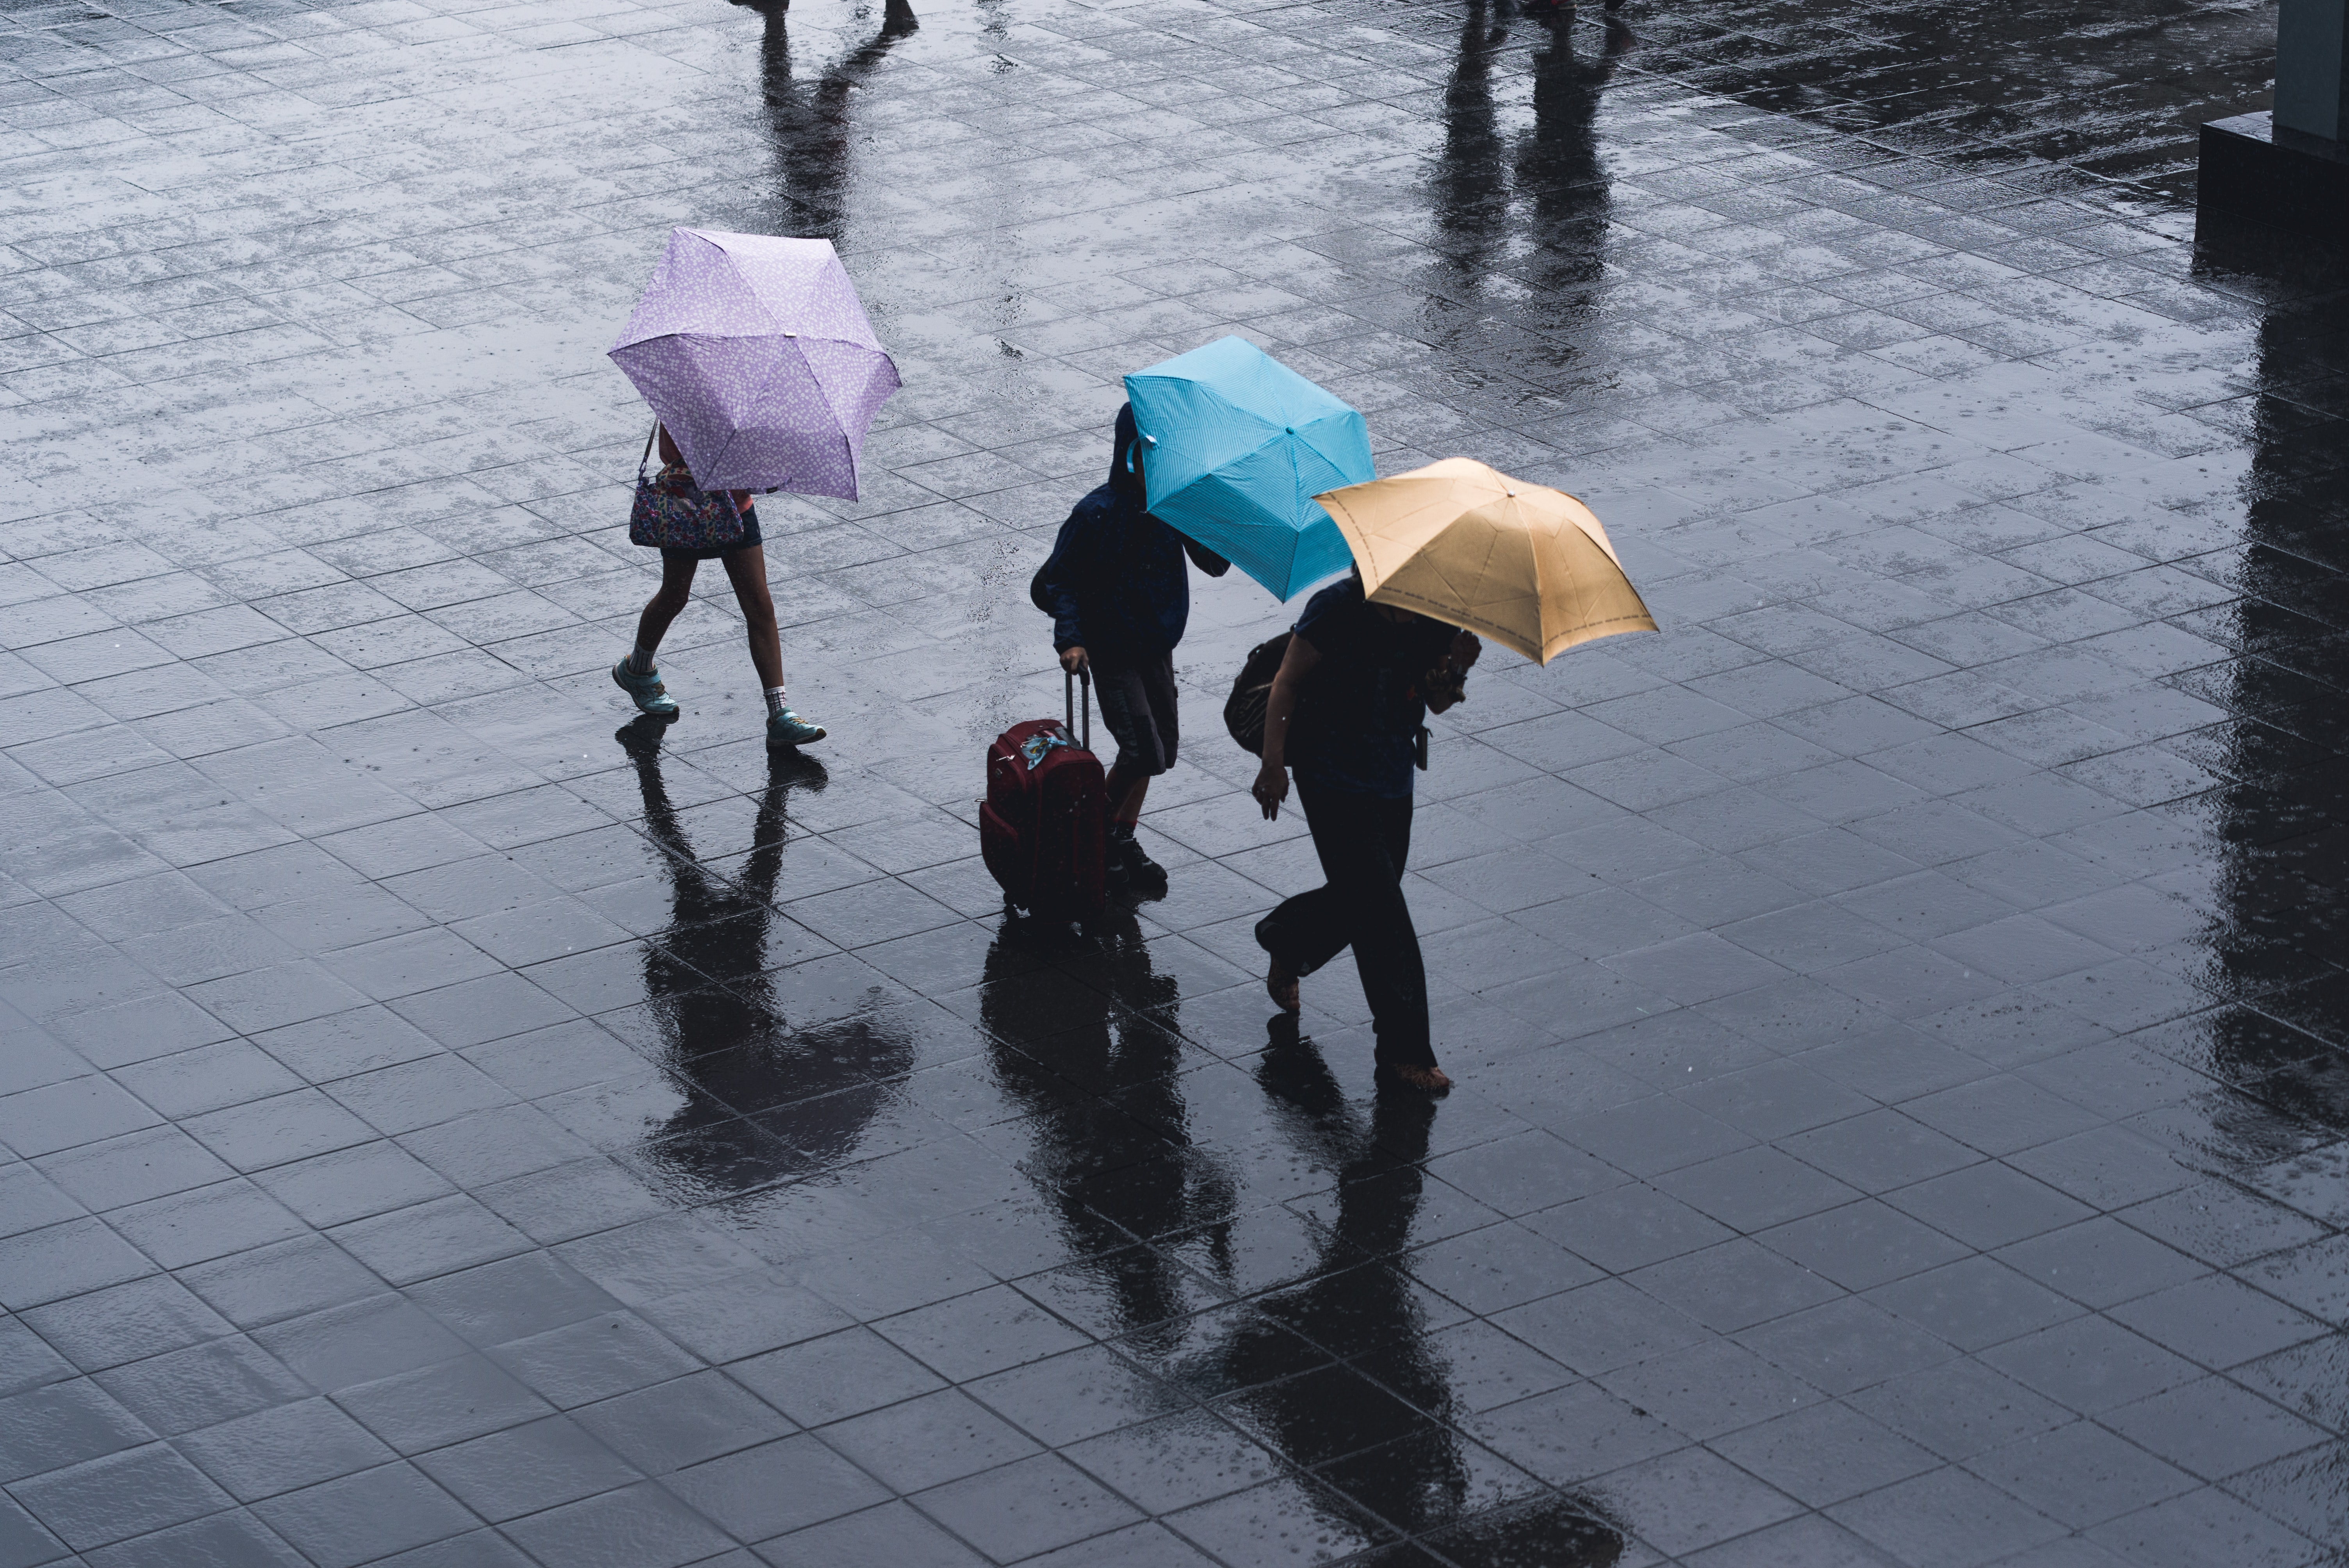 Jangan Lupa Bawa Perlengkapan Ini Saat Mengikuti Bimbel Kelas di Musim Hujan